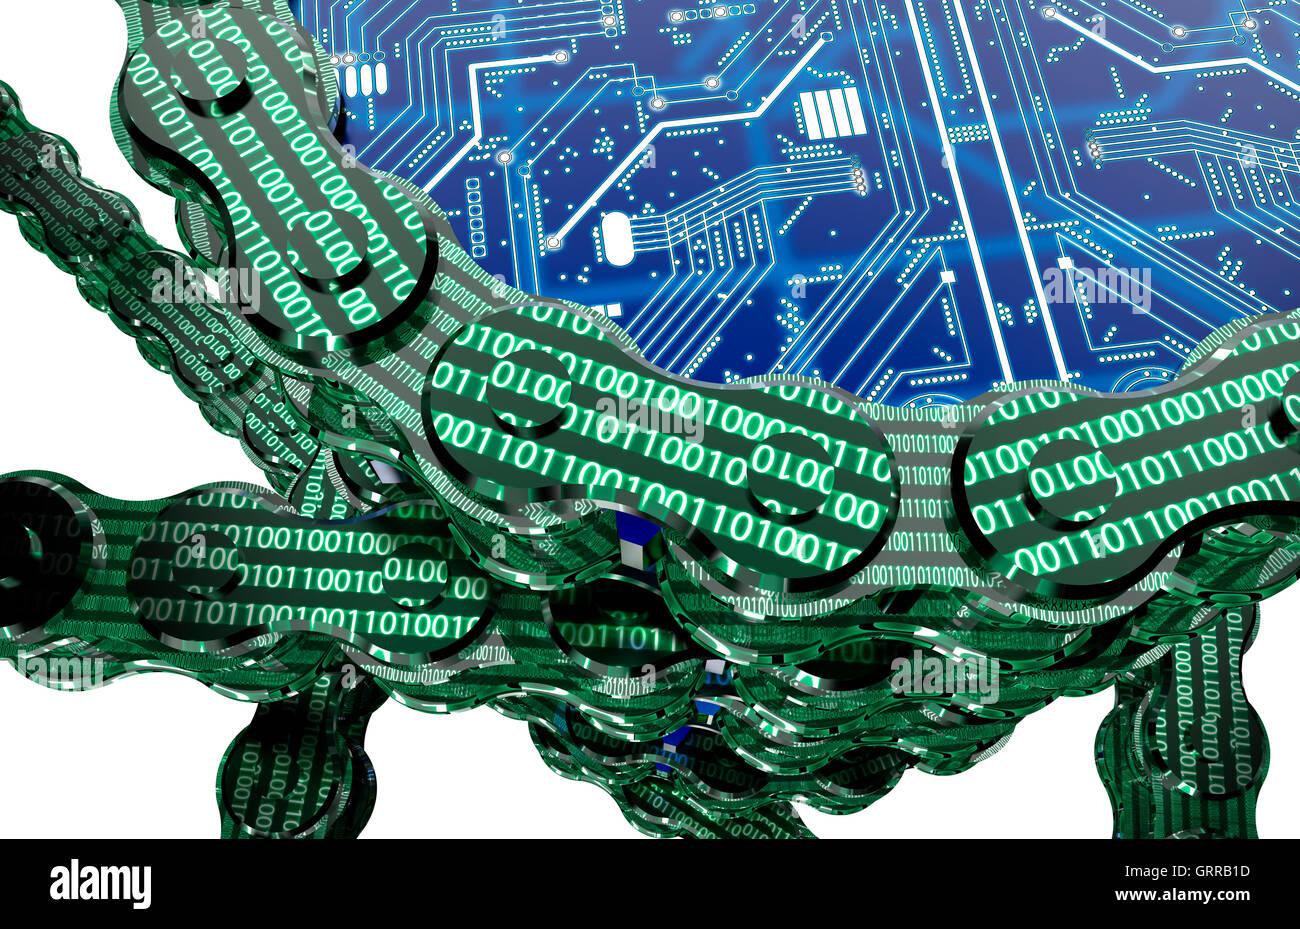 digital computer blockchain isolated on white, 3d illustration - Stock Image